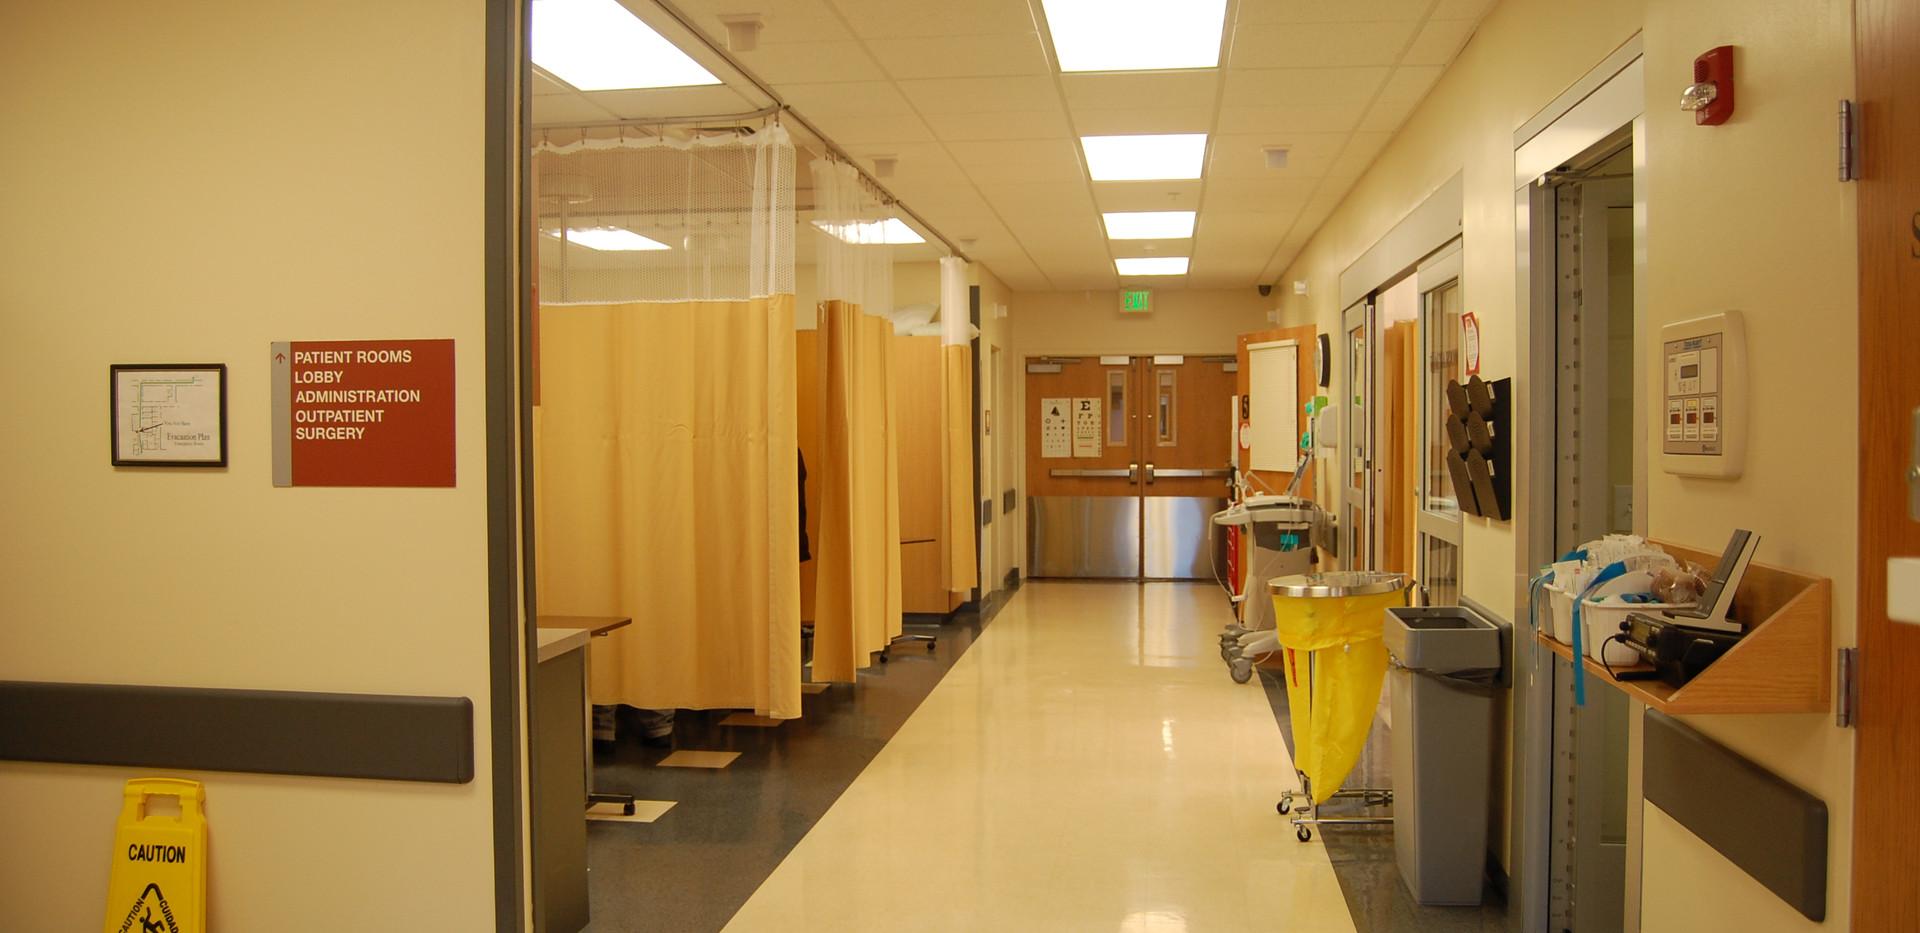 CV Hospital ER Addition 3.JPG